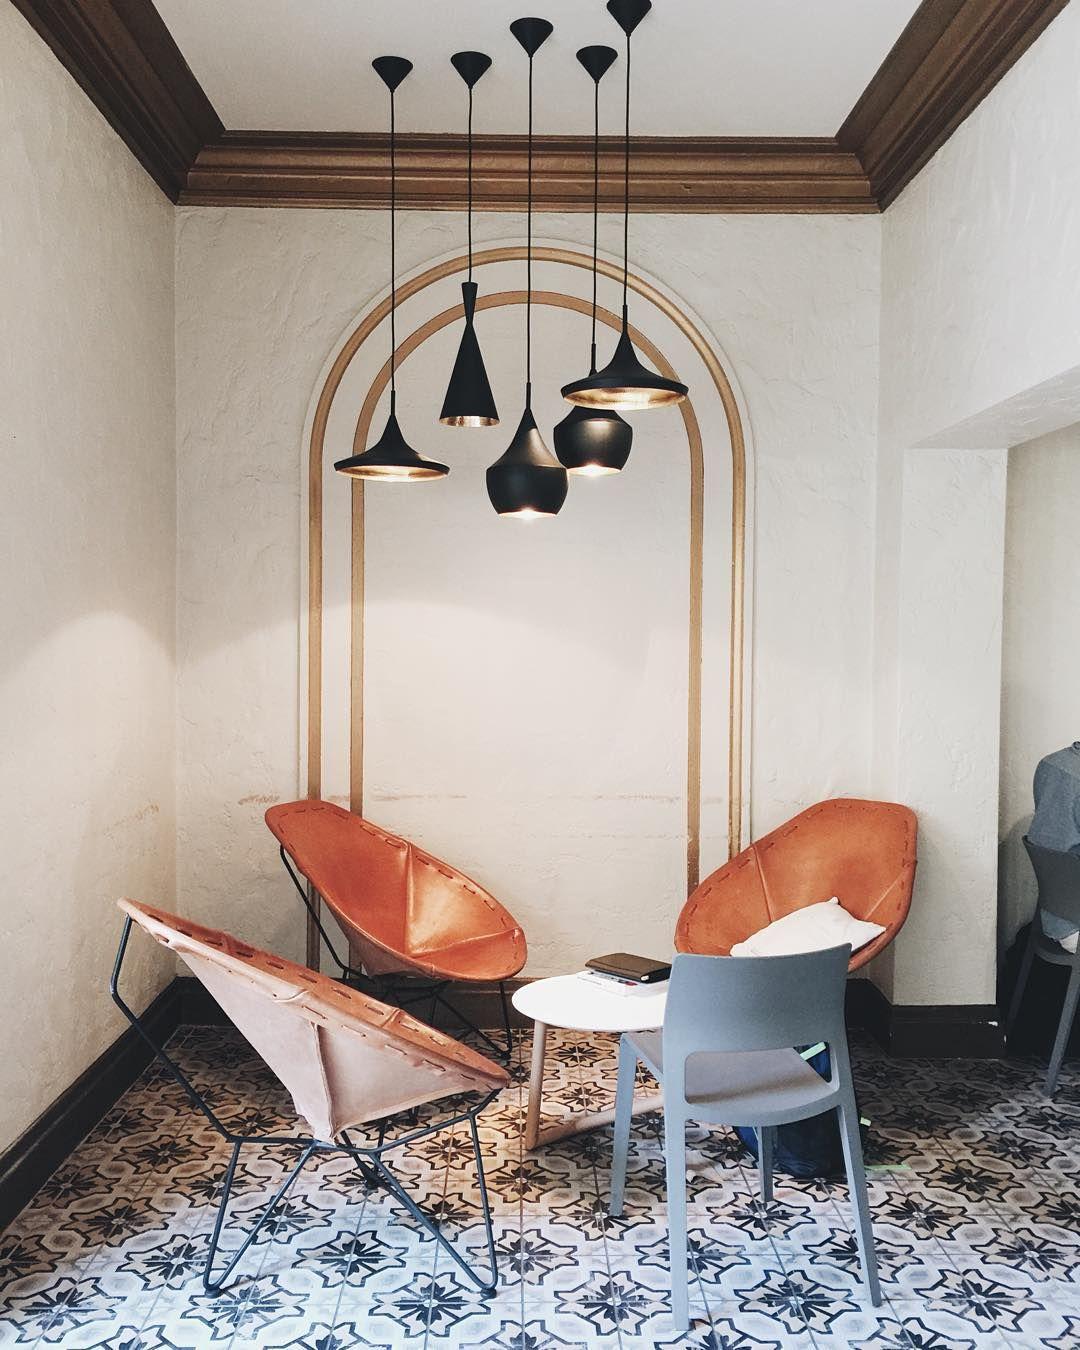 tom dixon palo alto ca project by gensler design via archiproducts interior design - Interior Design Palo Alto